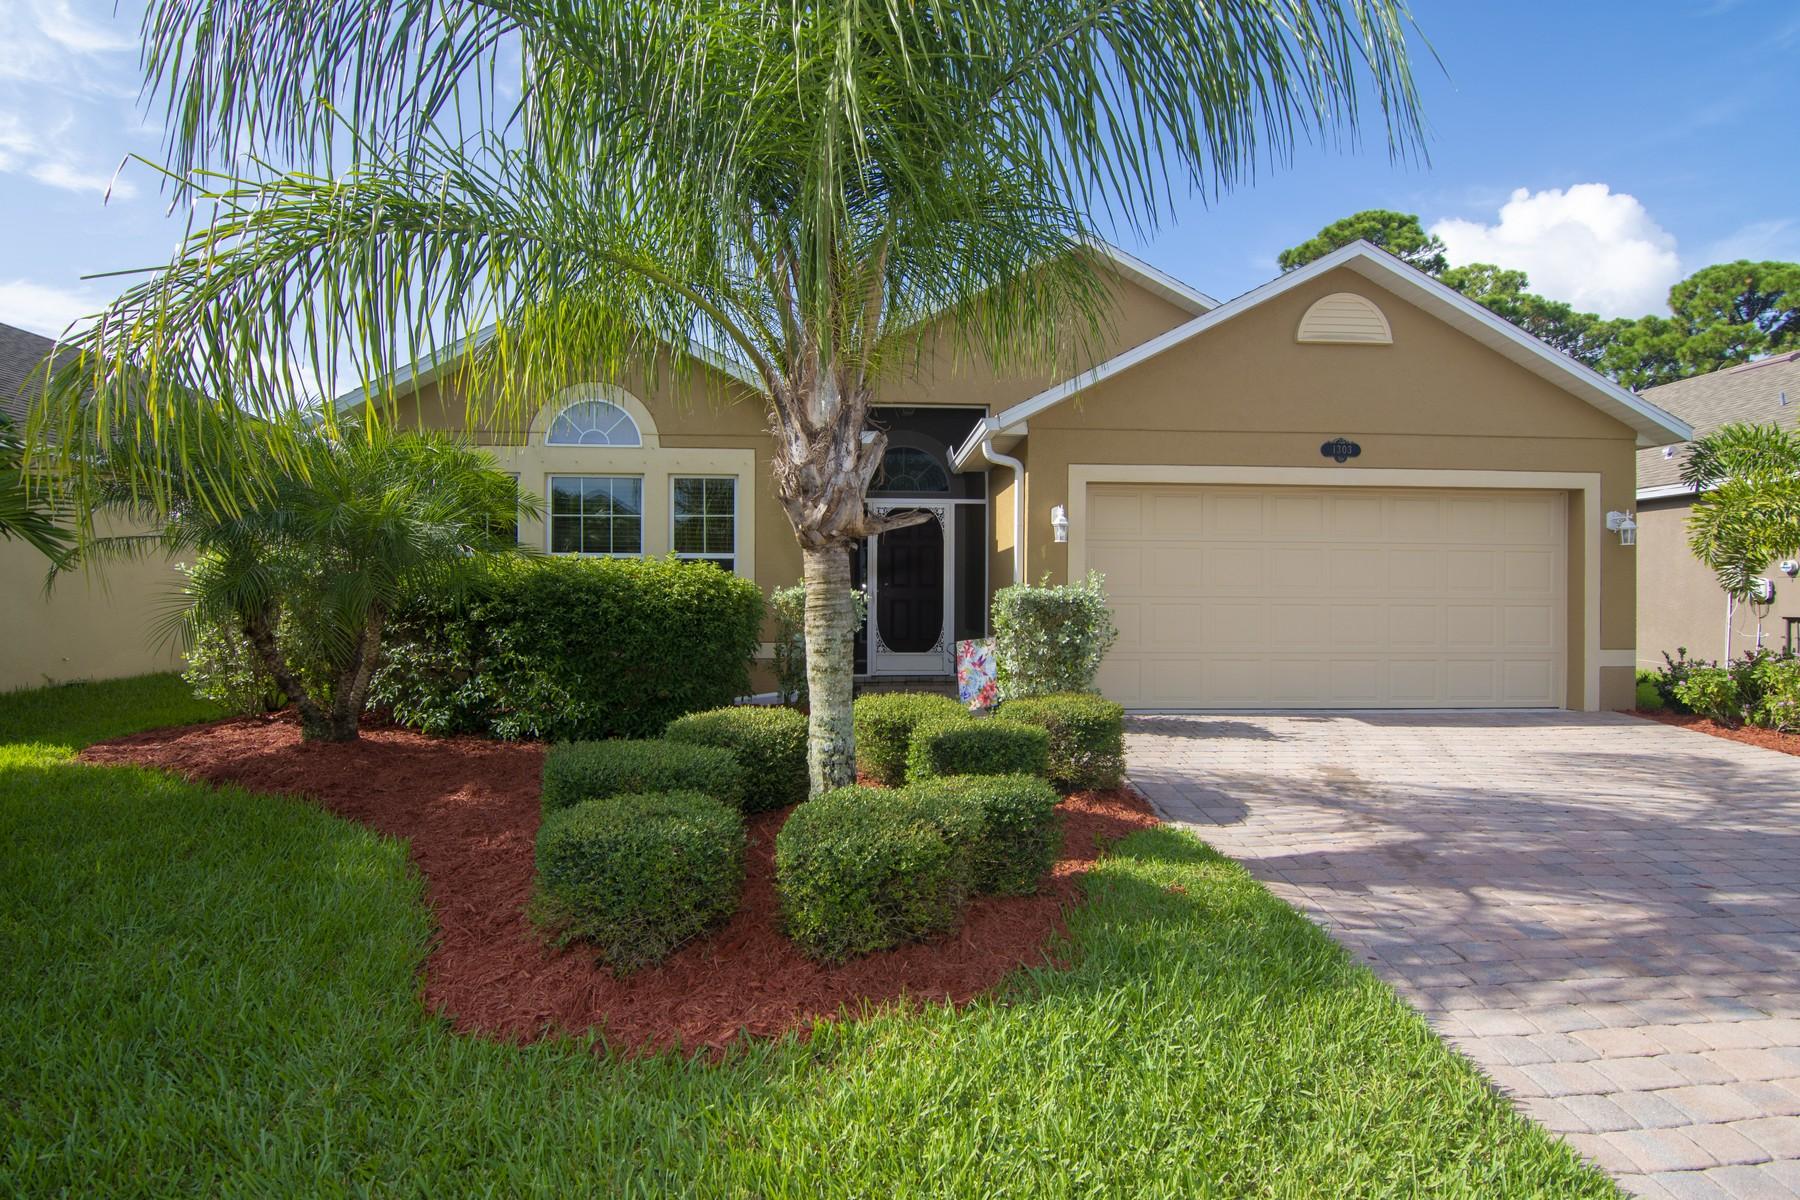 Marvelous Four Bedroom Home That Backs to Preserve Area 1303 Lexington Square SW Vero Beach, Florida 32962 Estados Unidos